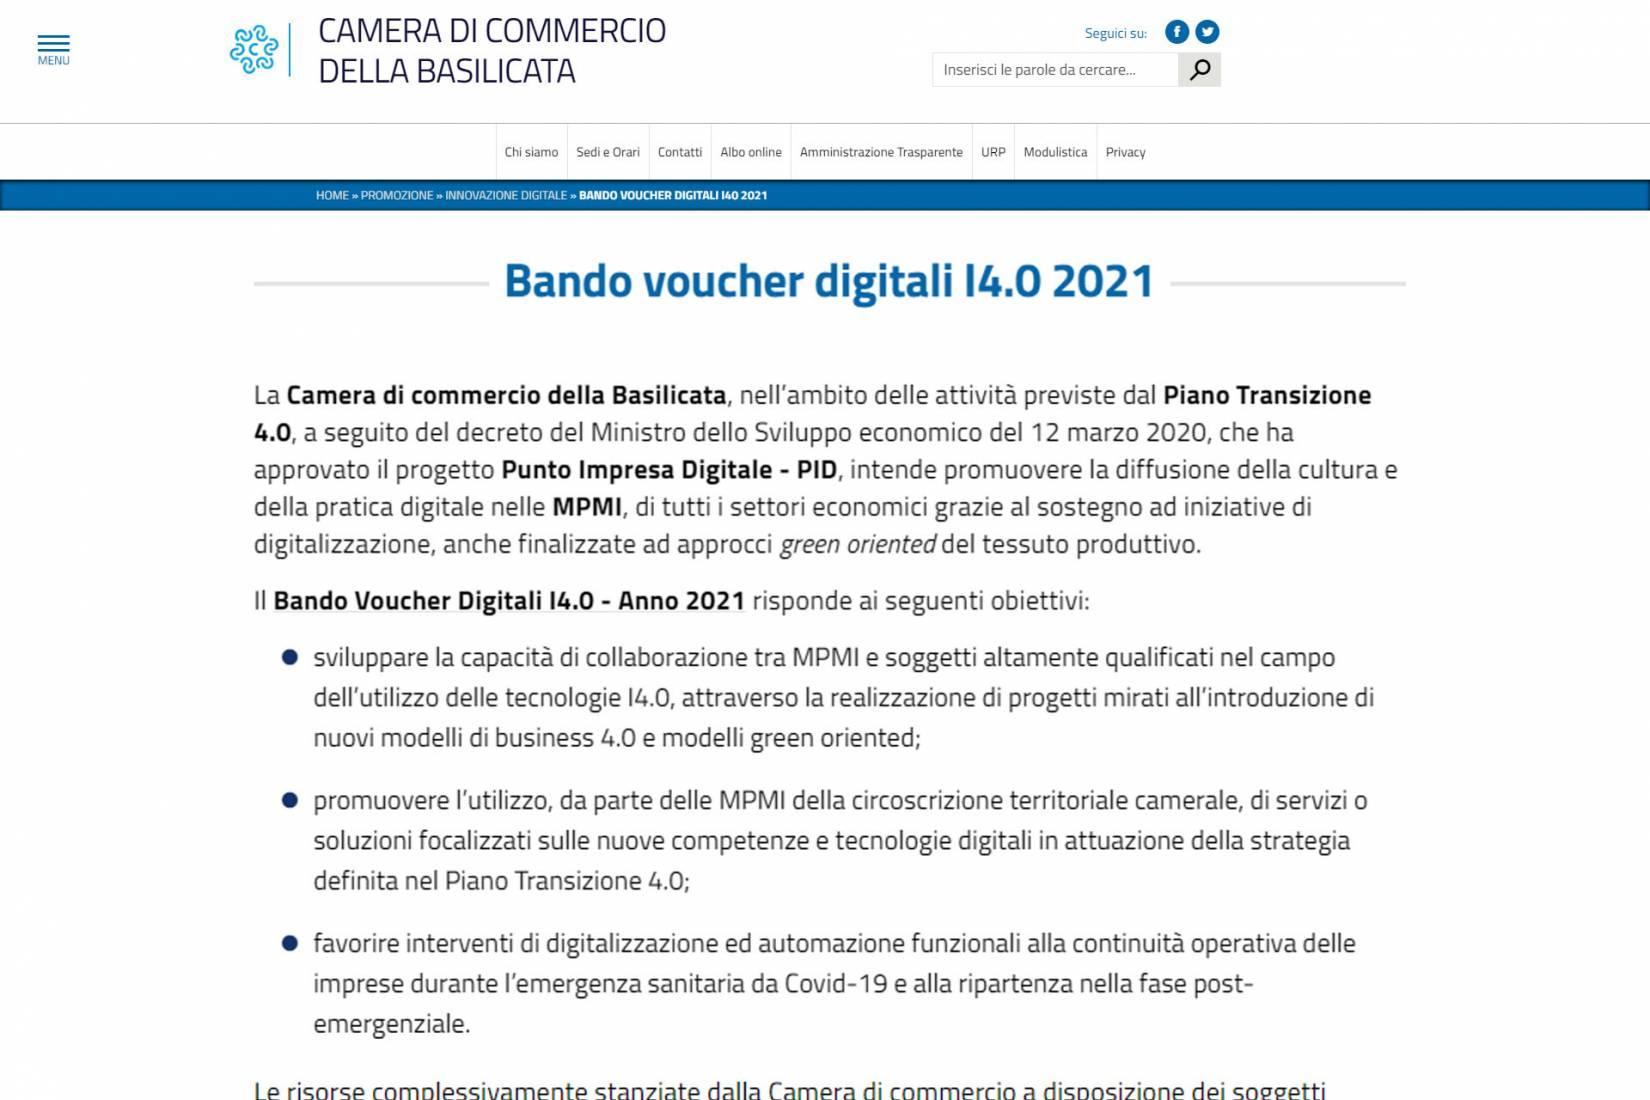 Bando Voucher Digitali i4.0 Camera Commercio Basilicata 2021